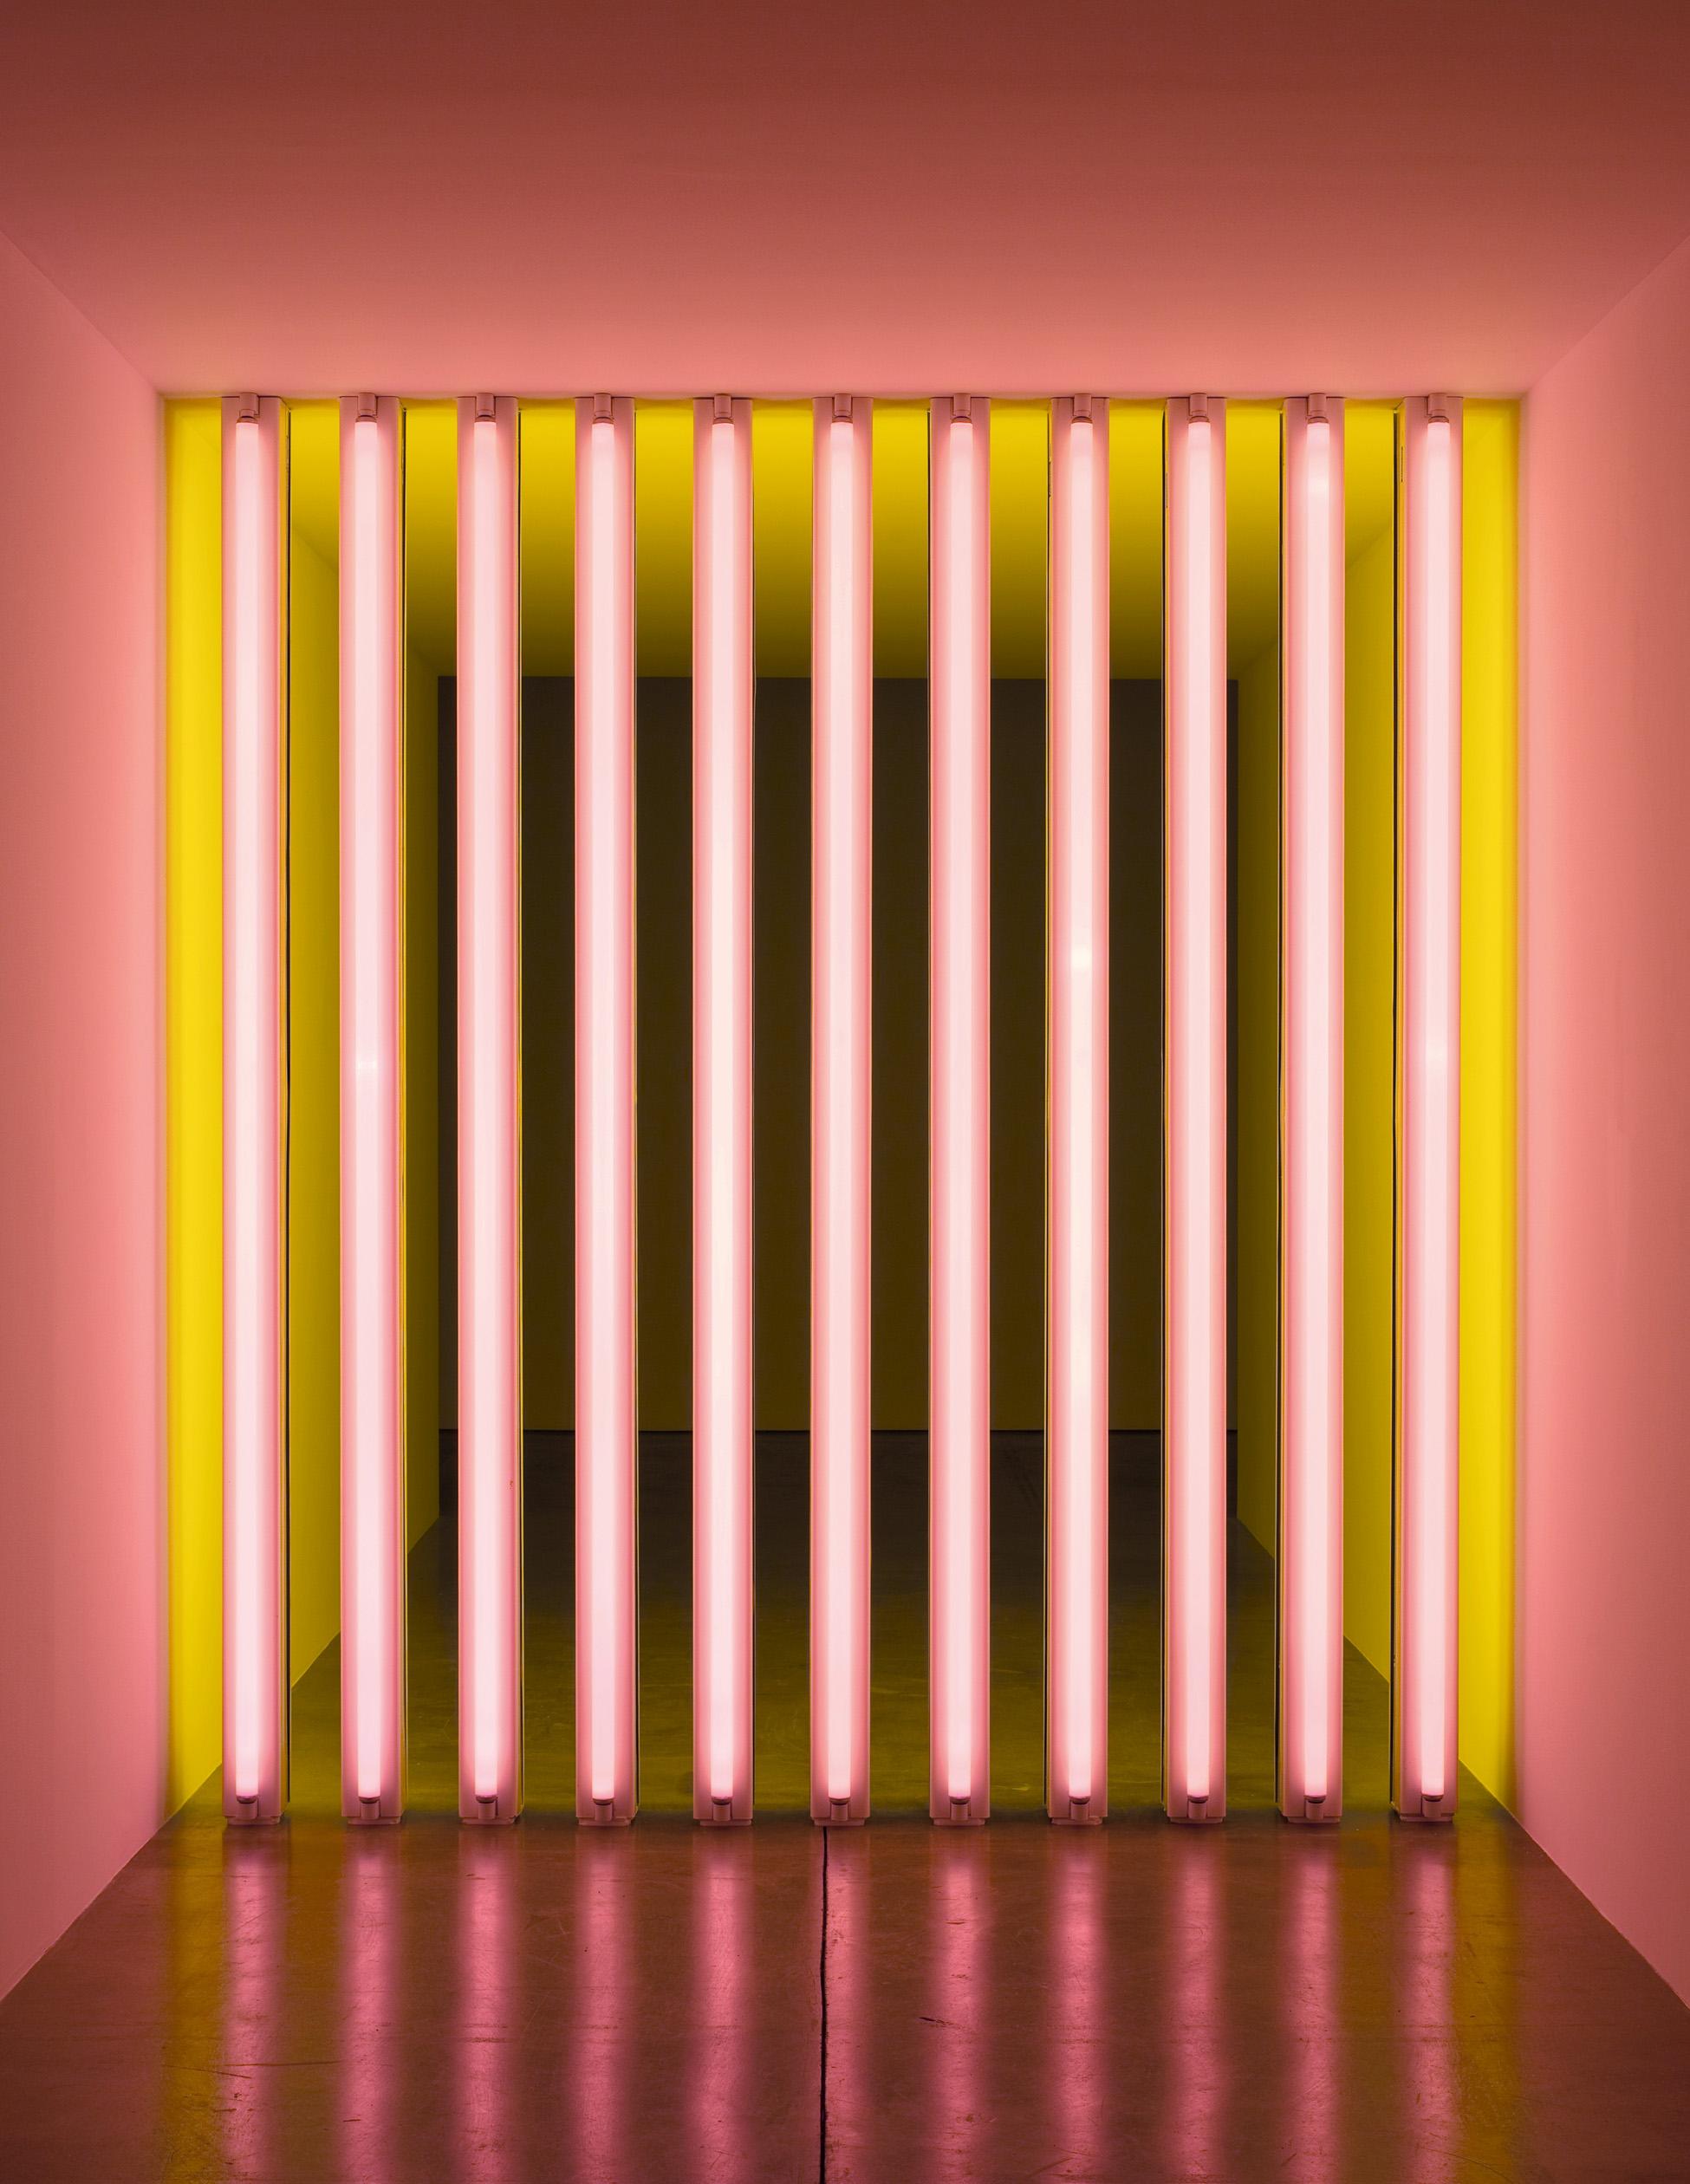 Repeating patterns rangeleymorton for Minimal art gallery